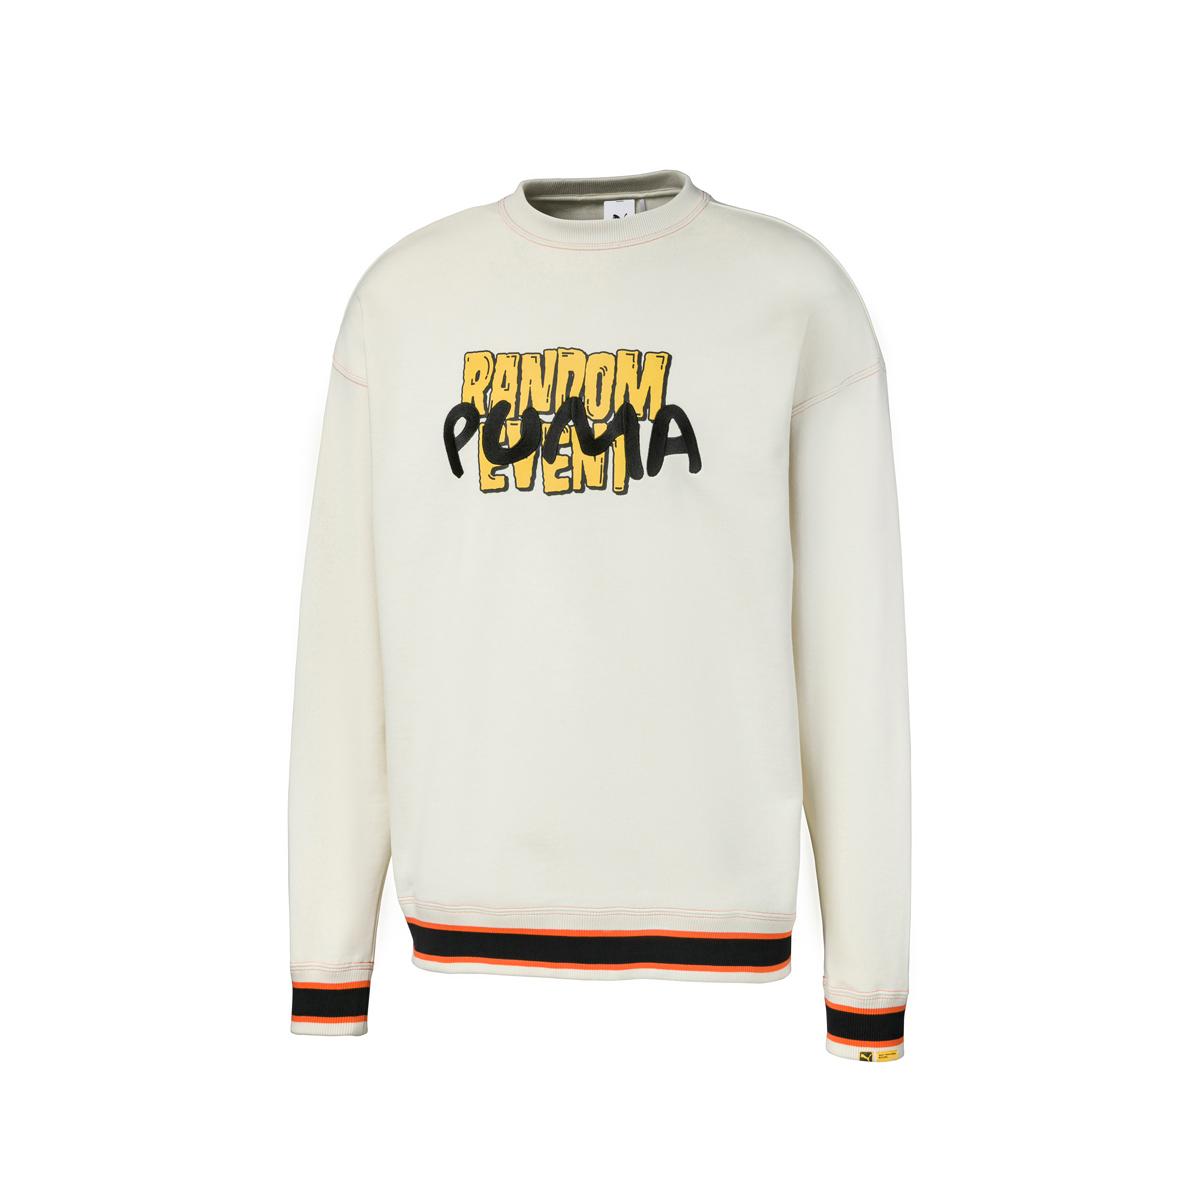 PUMA x RDET Graphic Crew(WHITE ASPARAG)(プーマ X RDET グラフィック クルー)【メンズ】【長袖Tシャツ】【20SP-I】